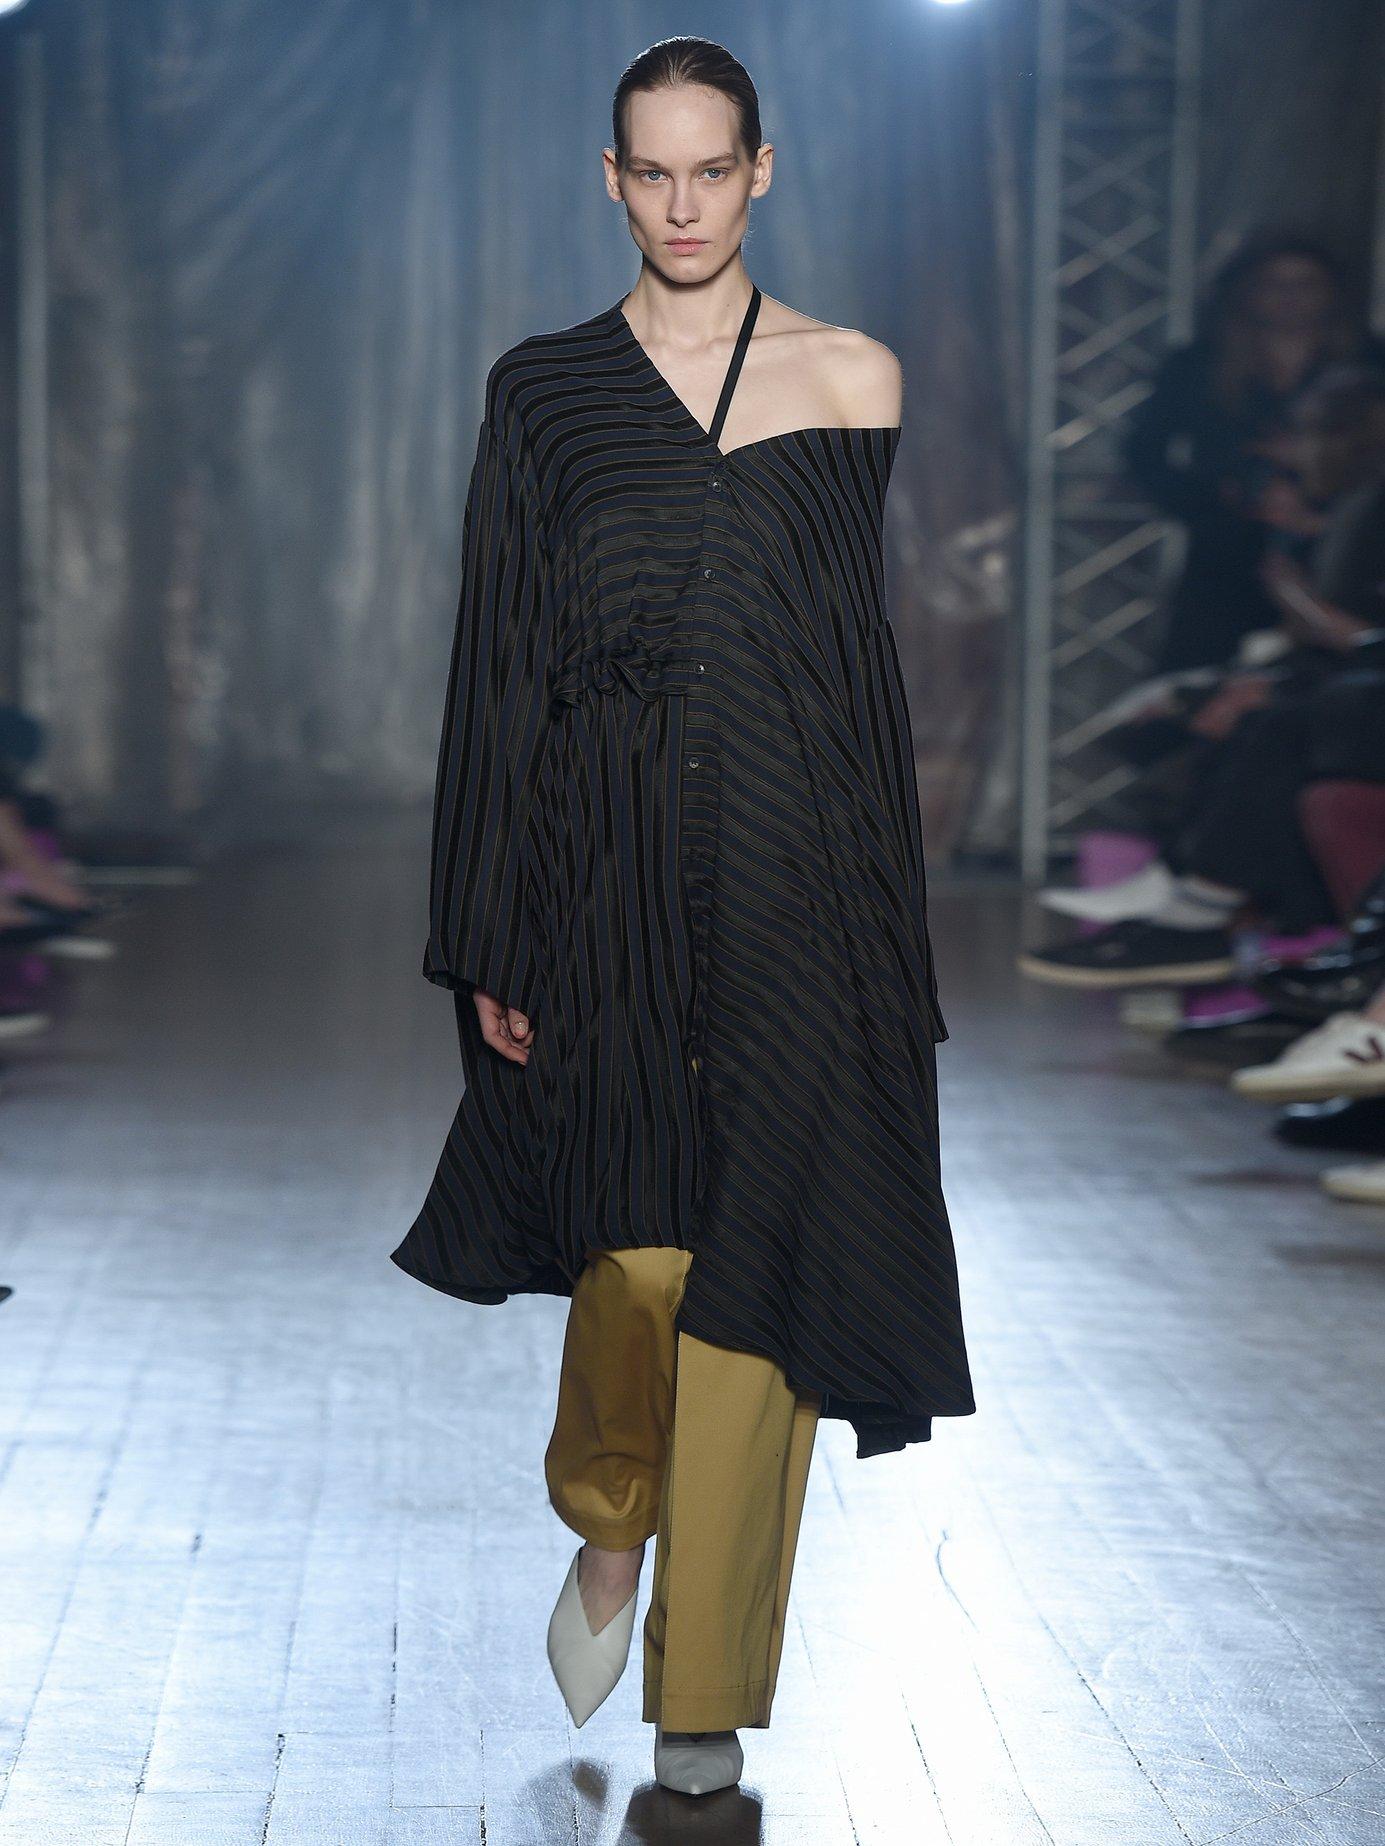 Jasmine asymmetric striped jacquard shirt dress by Palmer/Harding